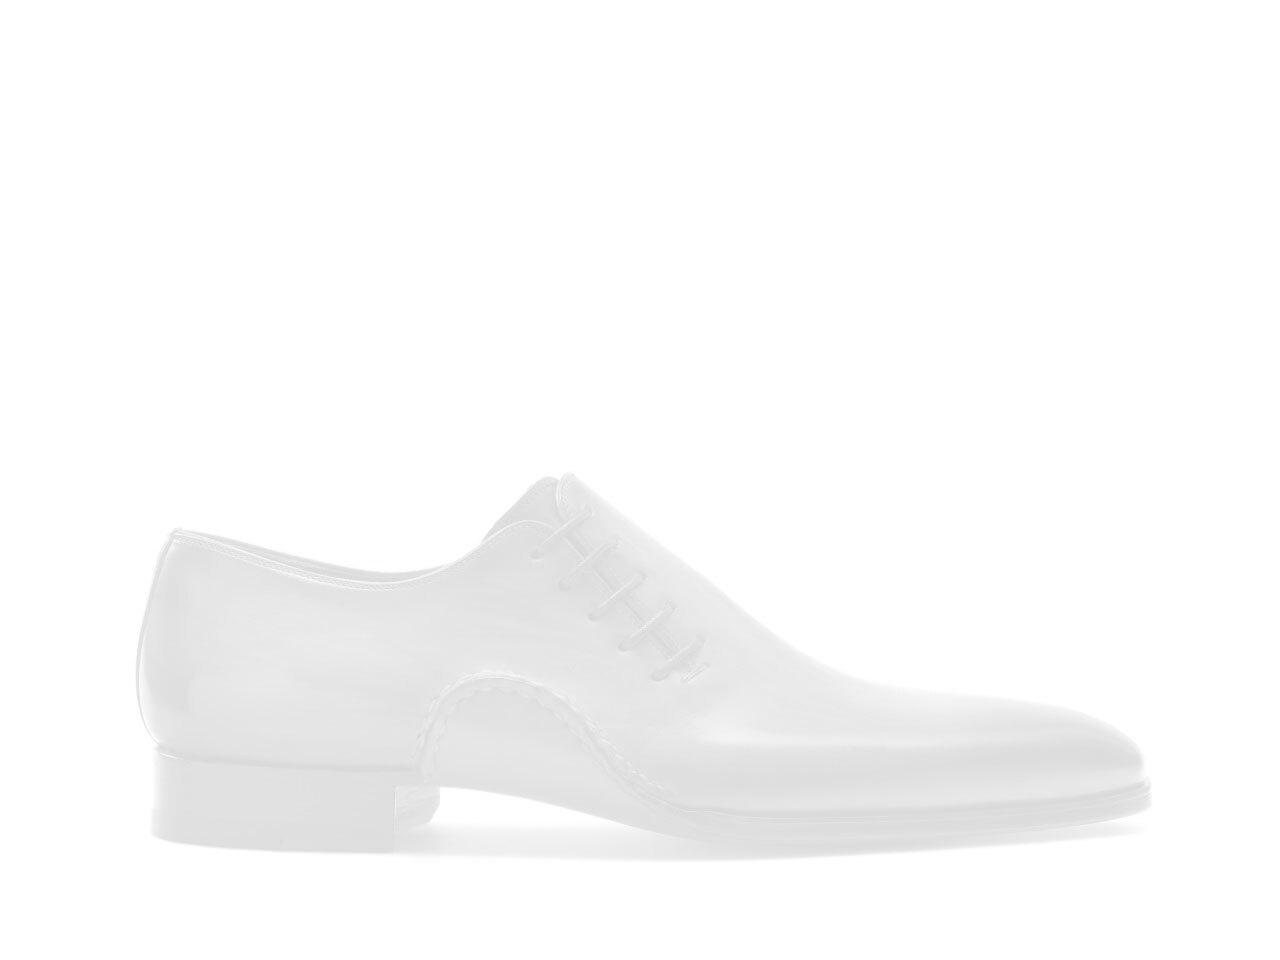 Pair of the Magnanni Kión Midbrown Men's Oxford Shoes